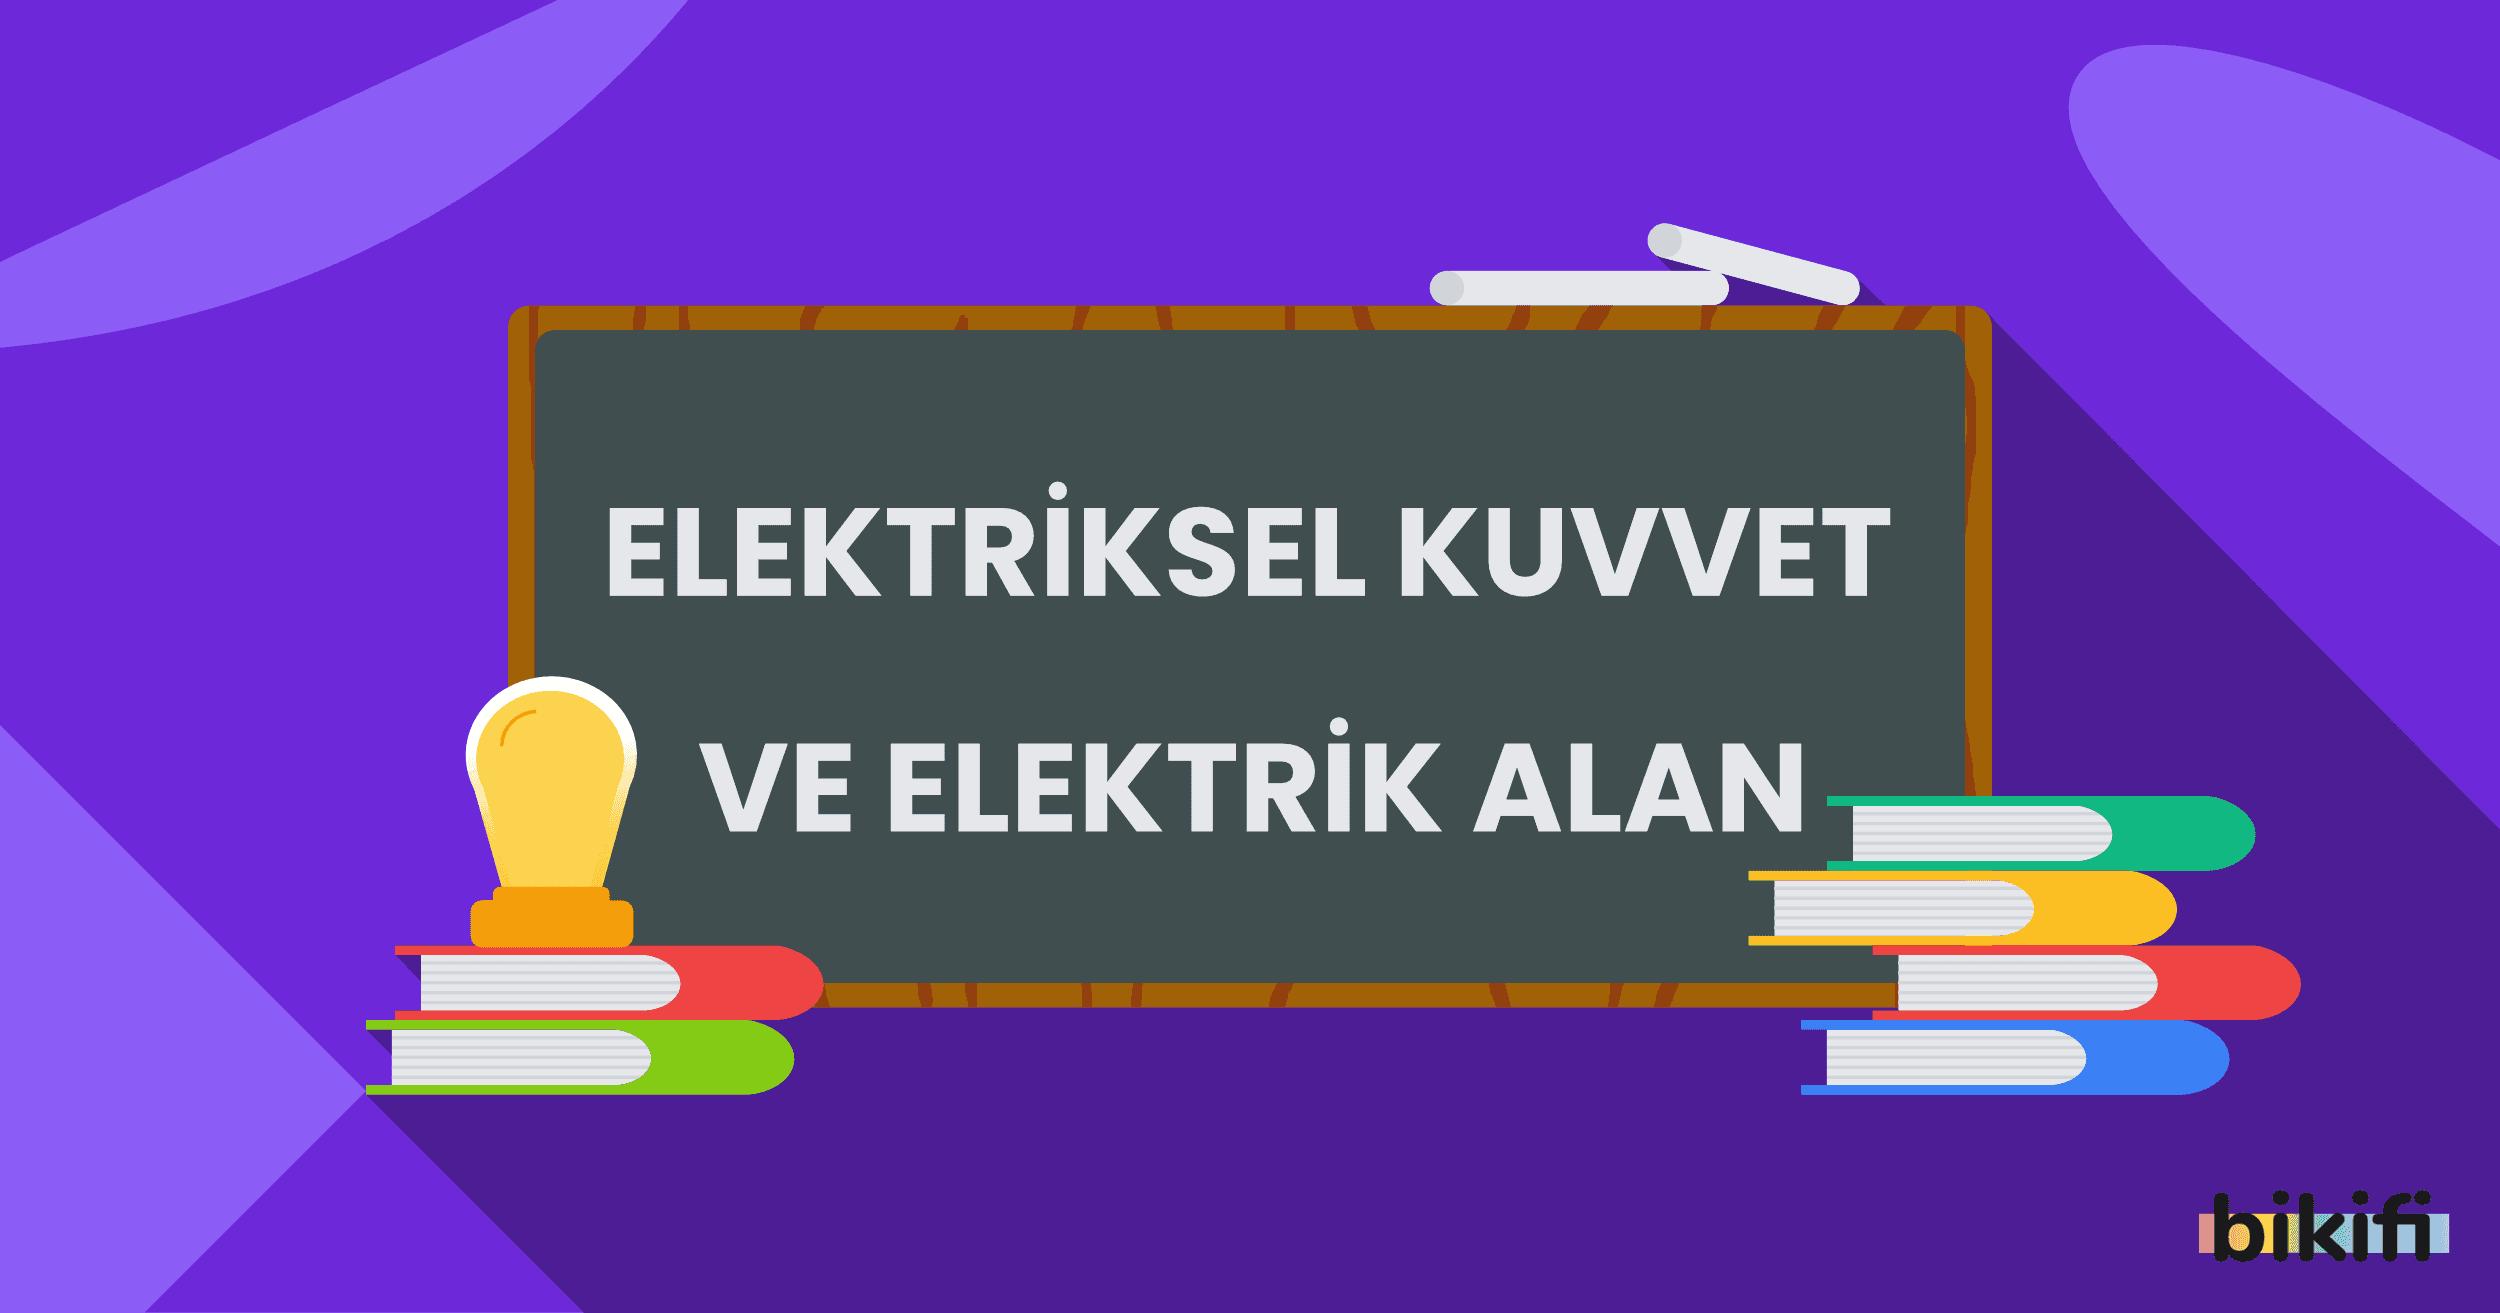 Elektriksel Kuvvet ve Elektrik Alan